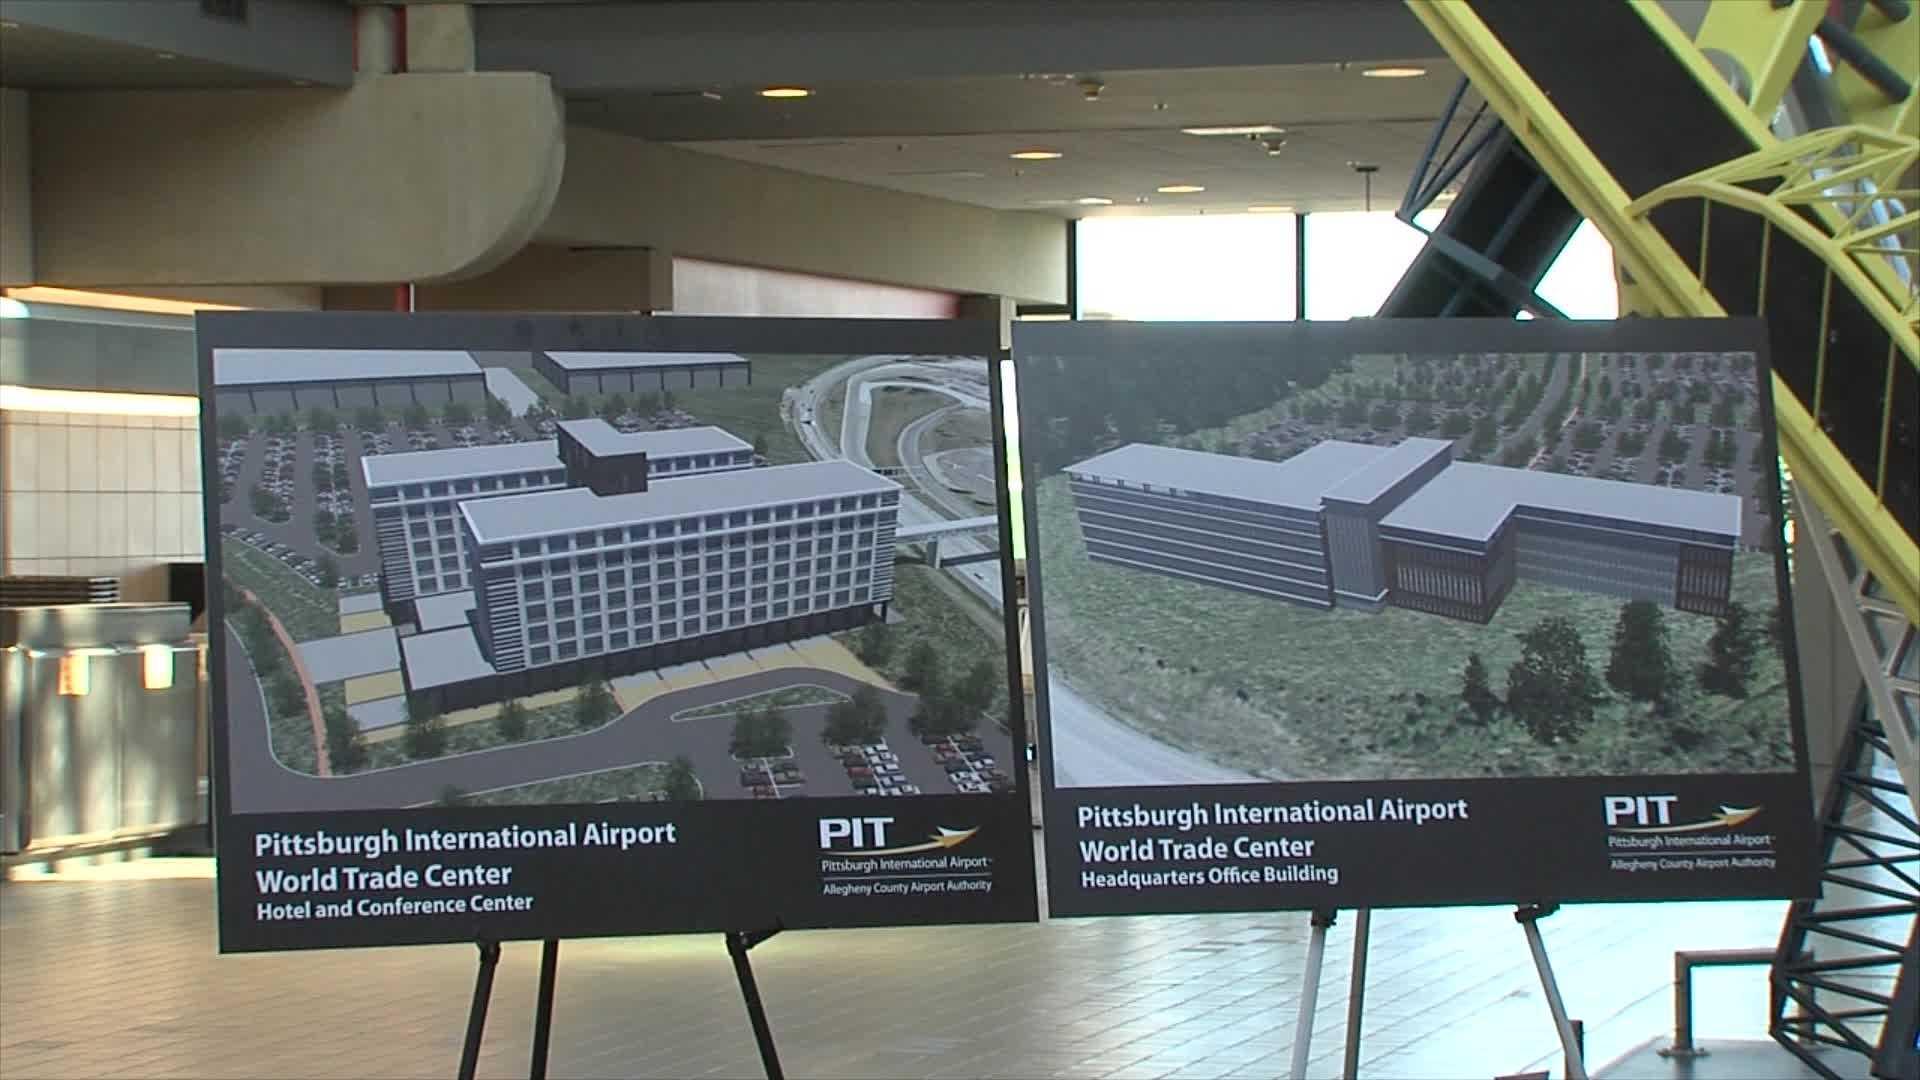 Pittsburgh International Airport World Trade Center